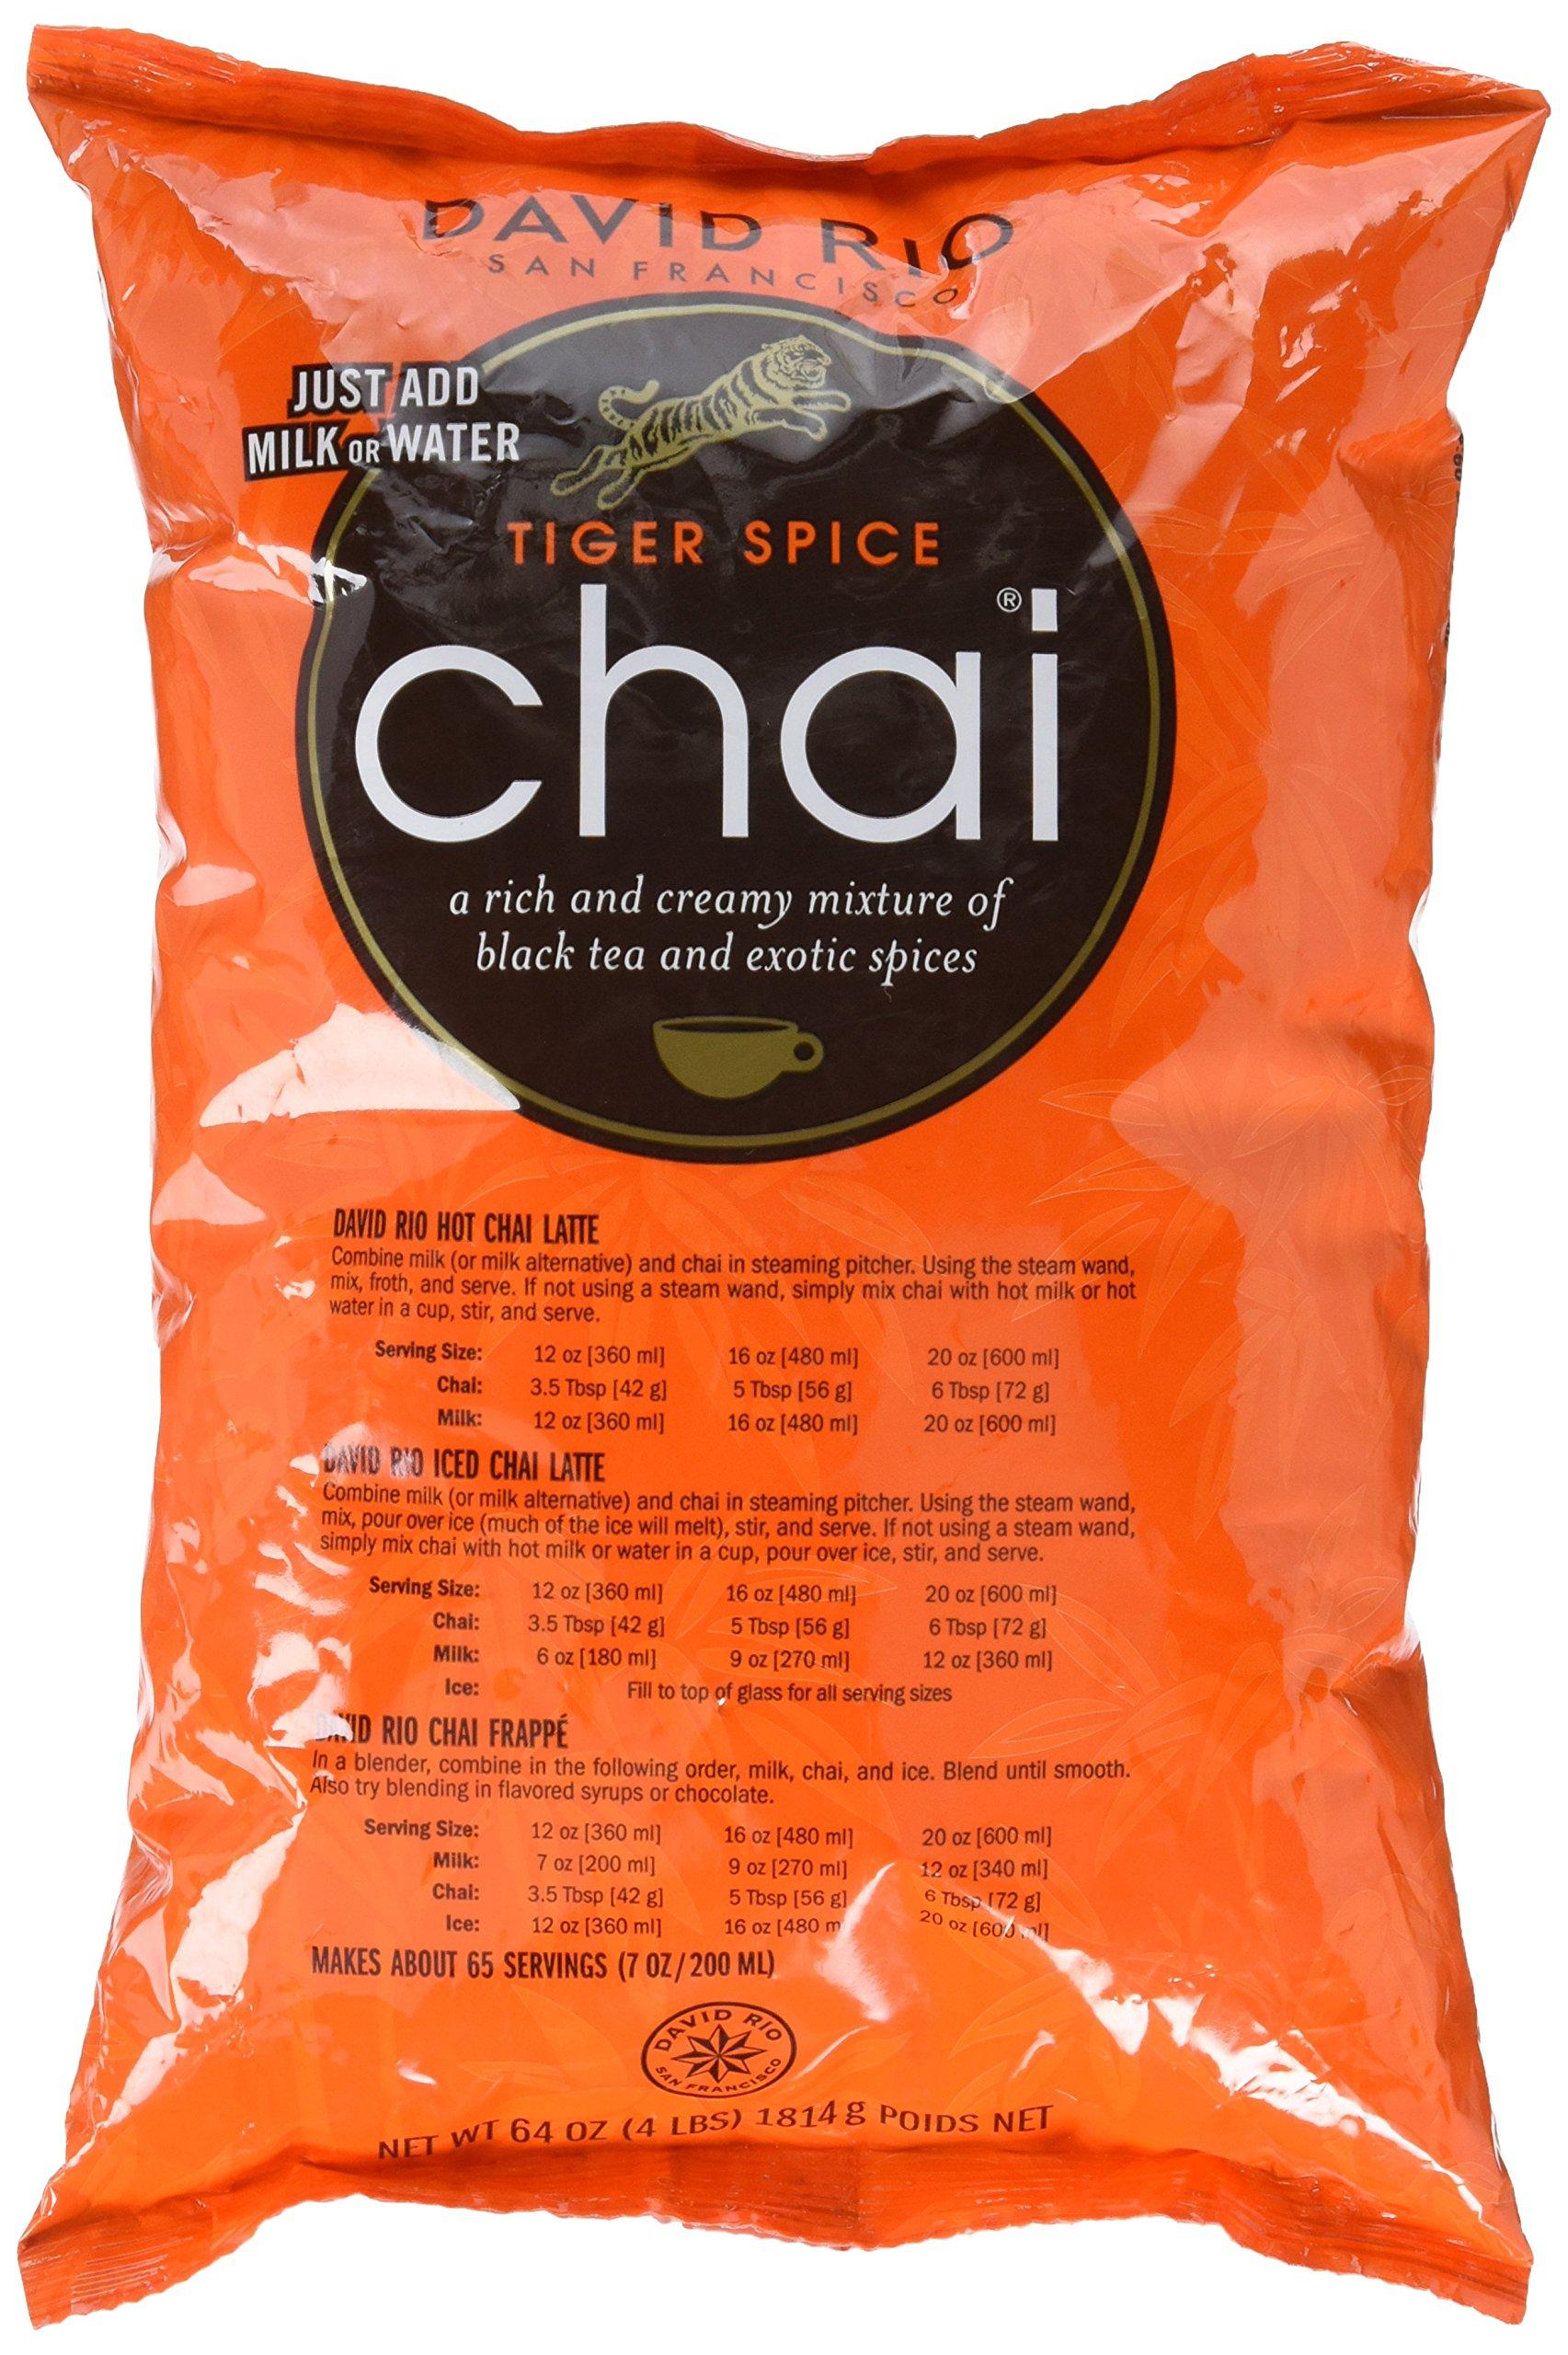 David Rio Food Service Bag Tiger Spice Chai, 1 Pack (1 x 1.8 kg) by David Rio